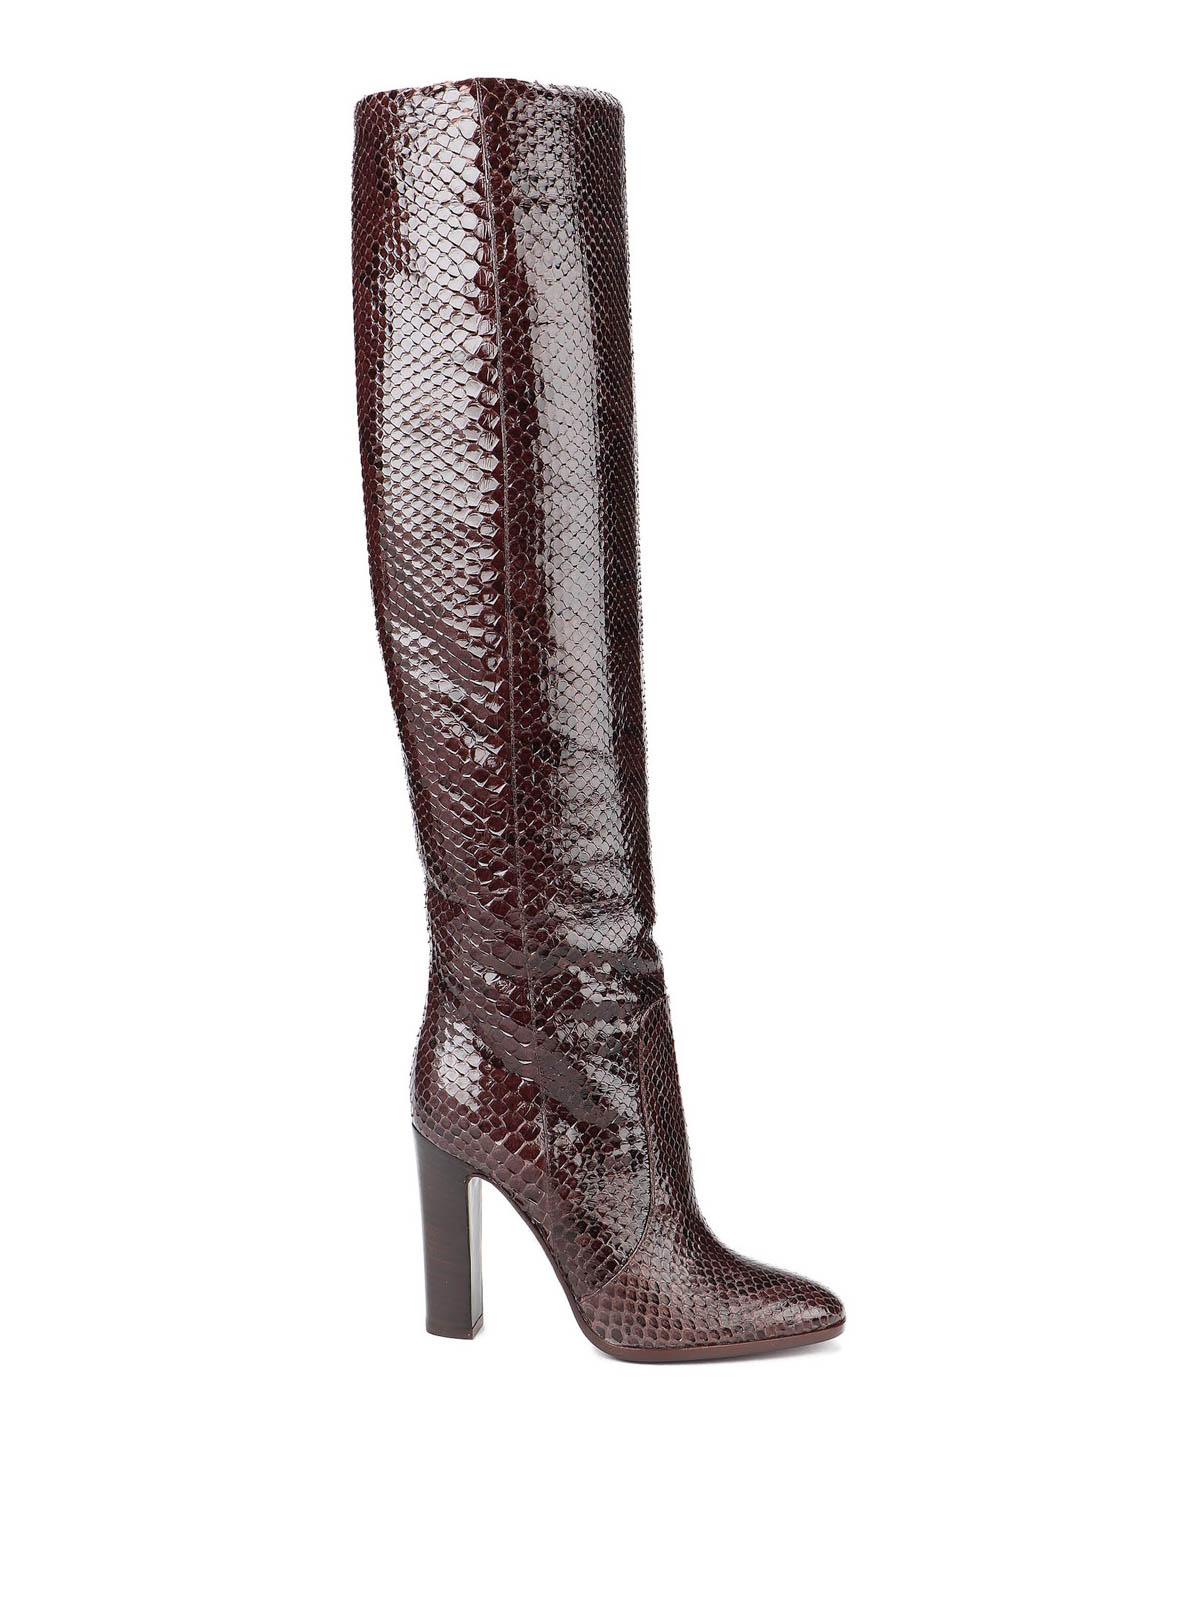 Dolce & Gabbana Leathers PATENT PYTHON LEATHER BOOTS